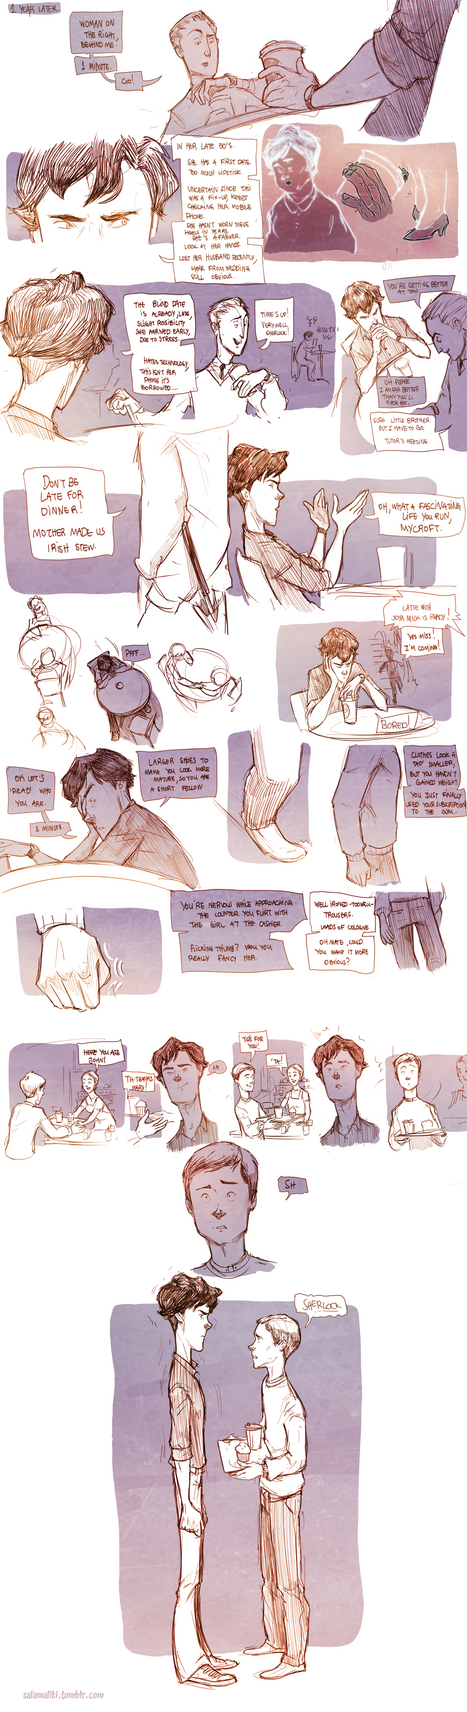 Teen Sherlock - The returns of John Watson by DrSlug